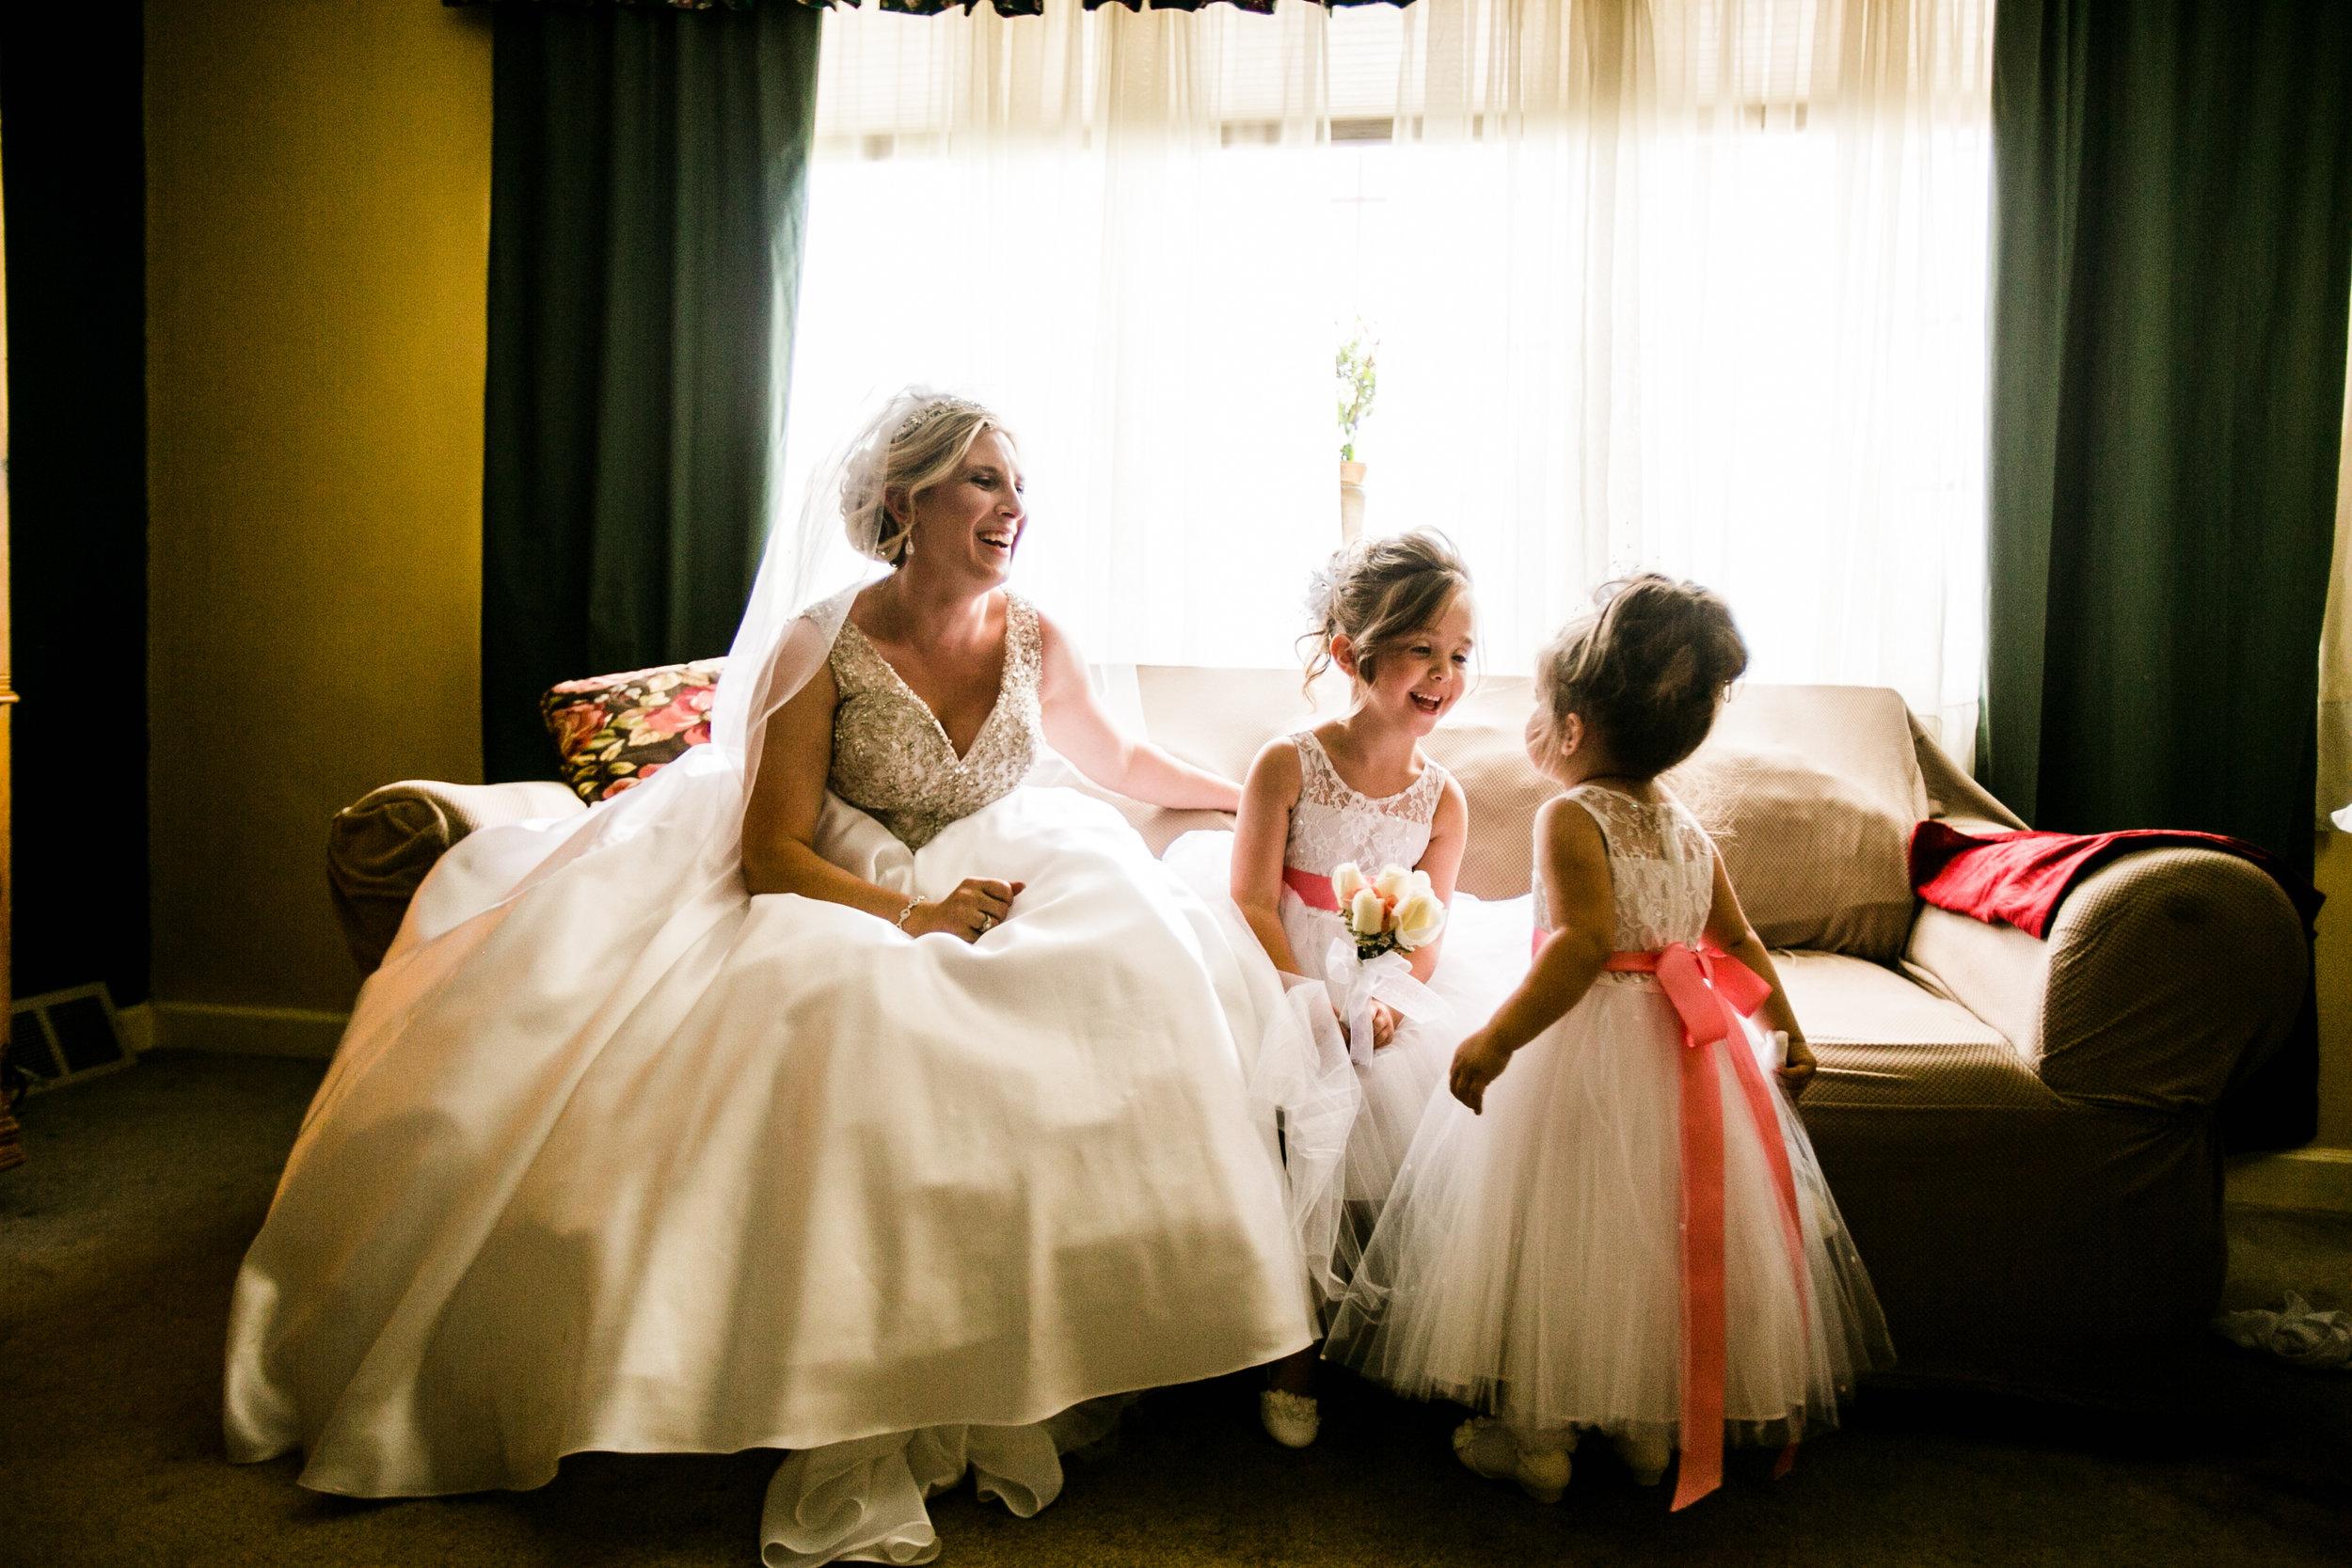 BENSALEM COUNTRY CLUB WEDDING PHOTOGRAPHY - 033.jpg